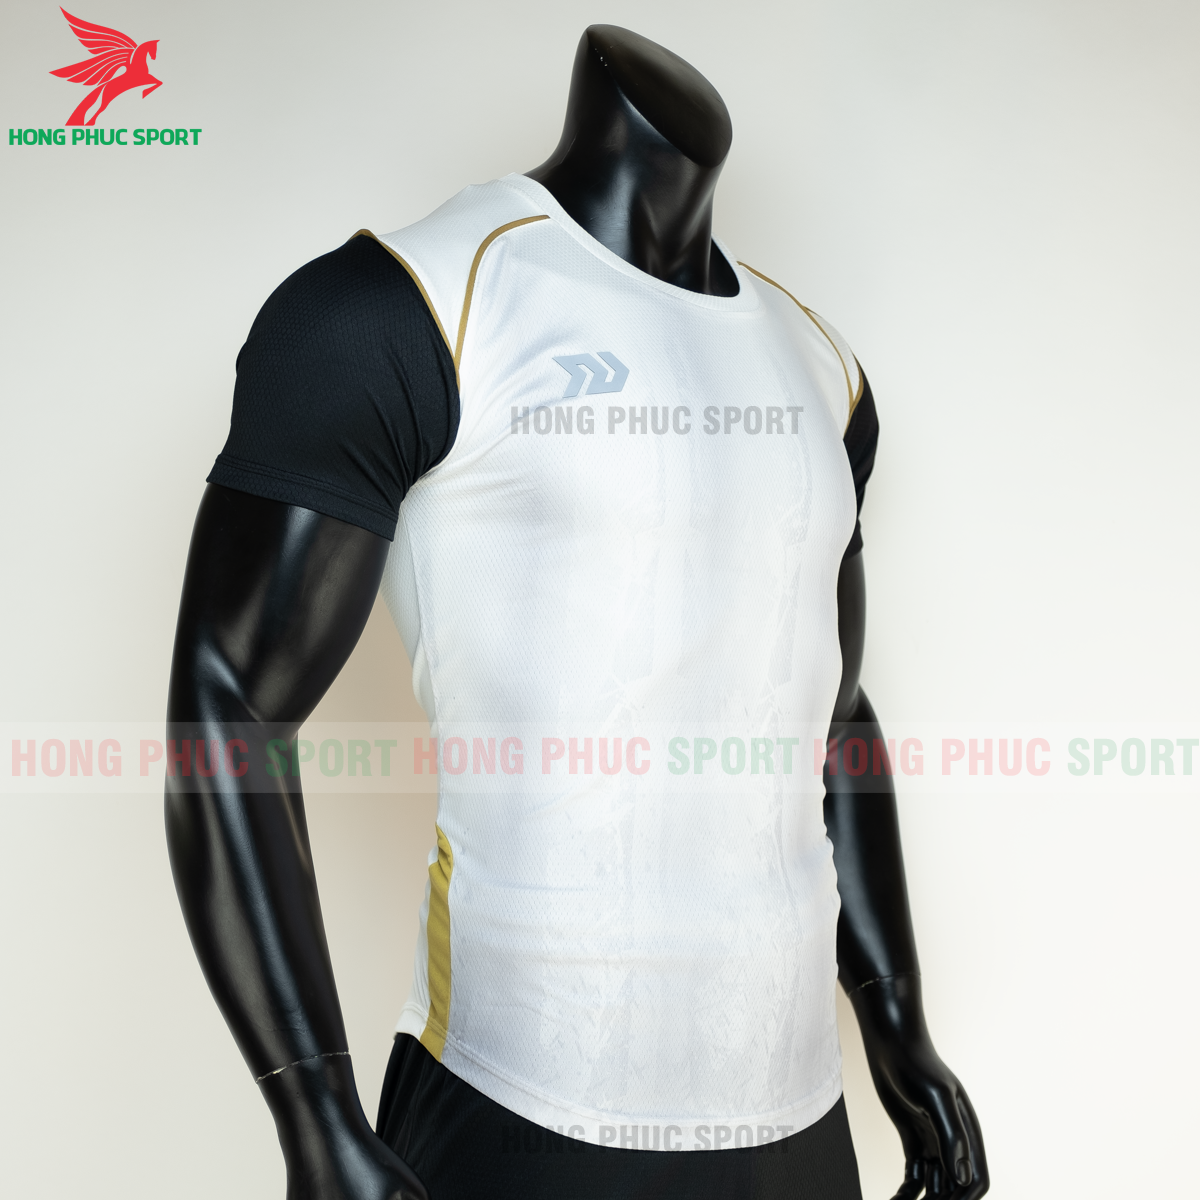 https://cdn.hongphucsport.com/unsafe/s4.shopbay.vn/files/285/ao-bong-da-khong-logo-bulbal-hades-mau-trang-3-604f30d8de67b.png